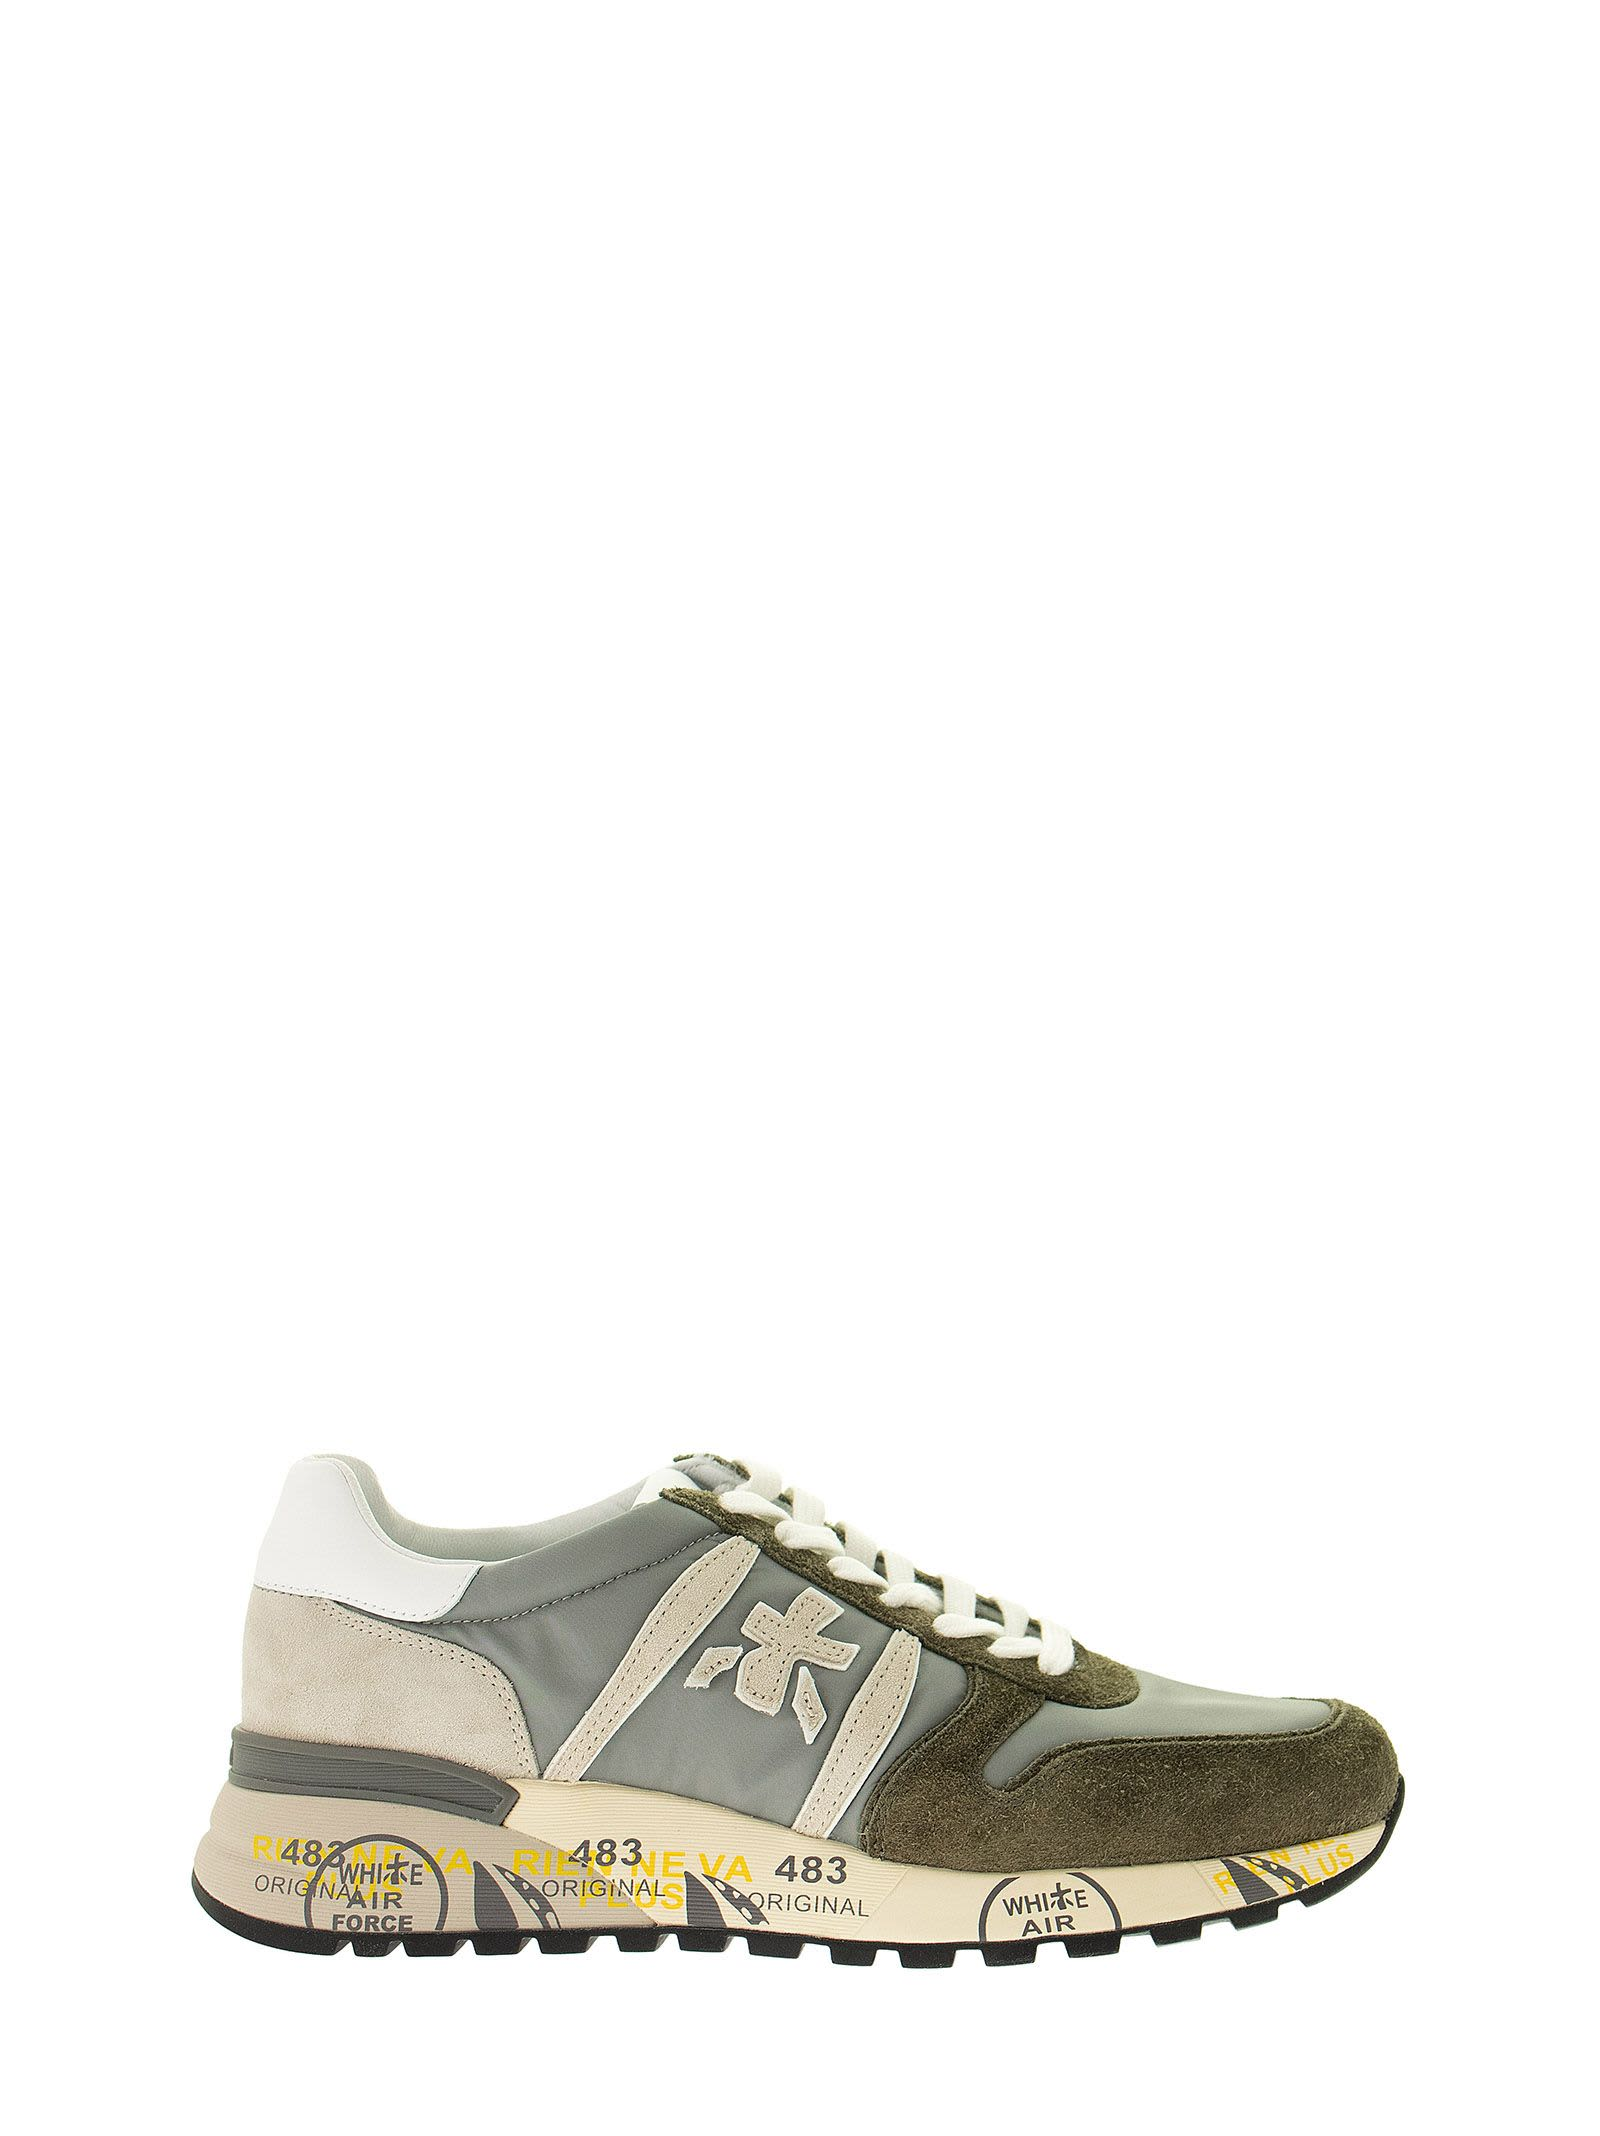 Premiata Shoes LANDER 5195 - SNEAKERS